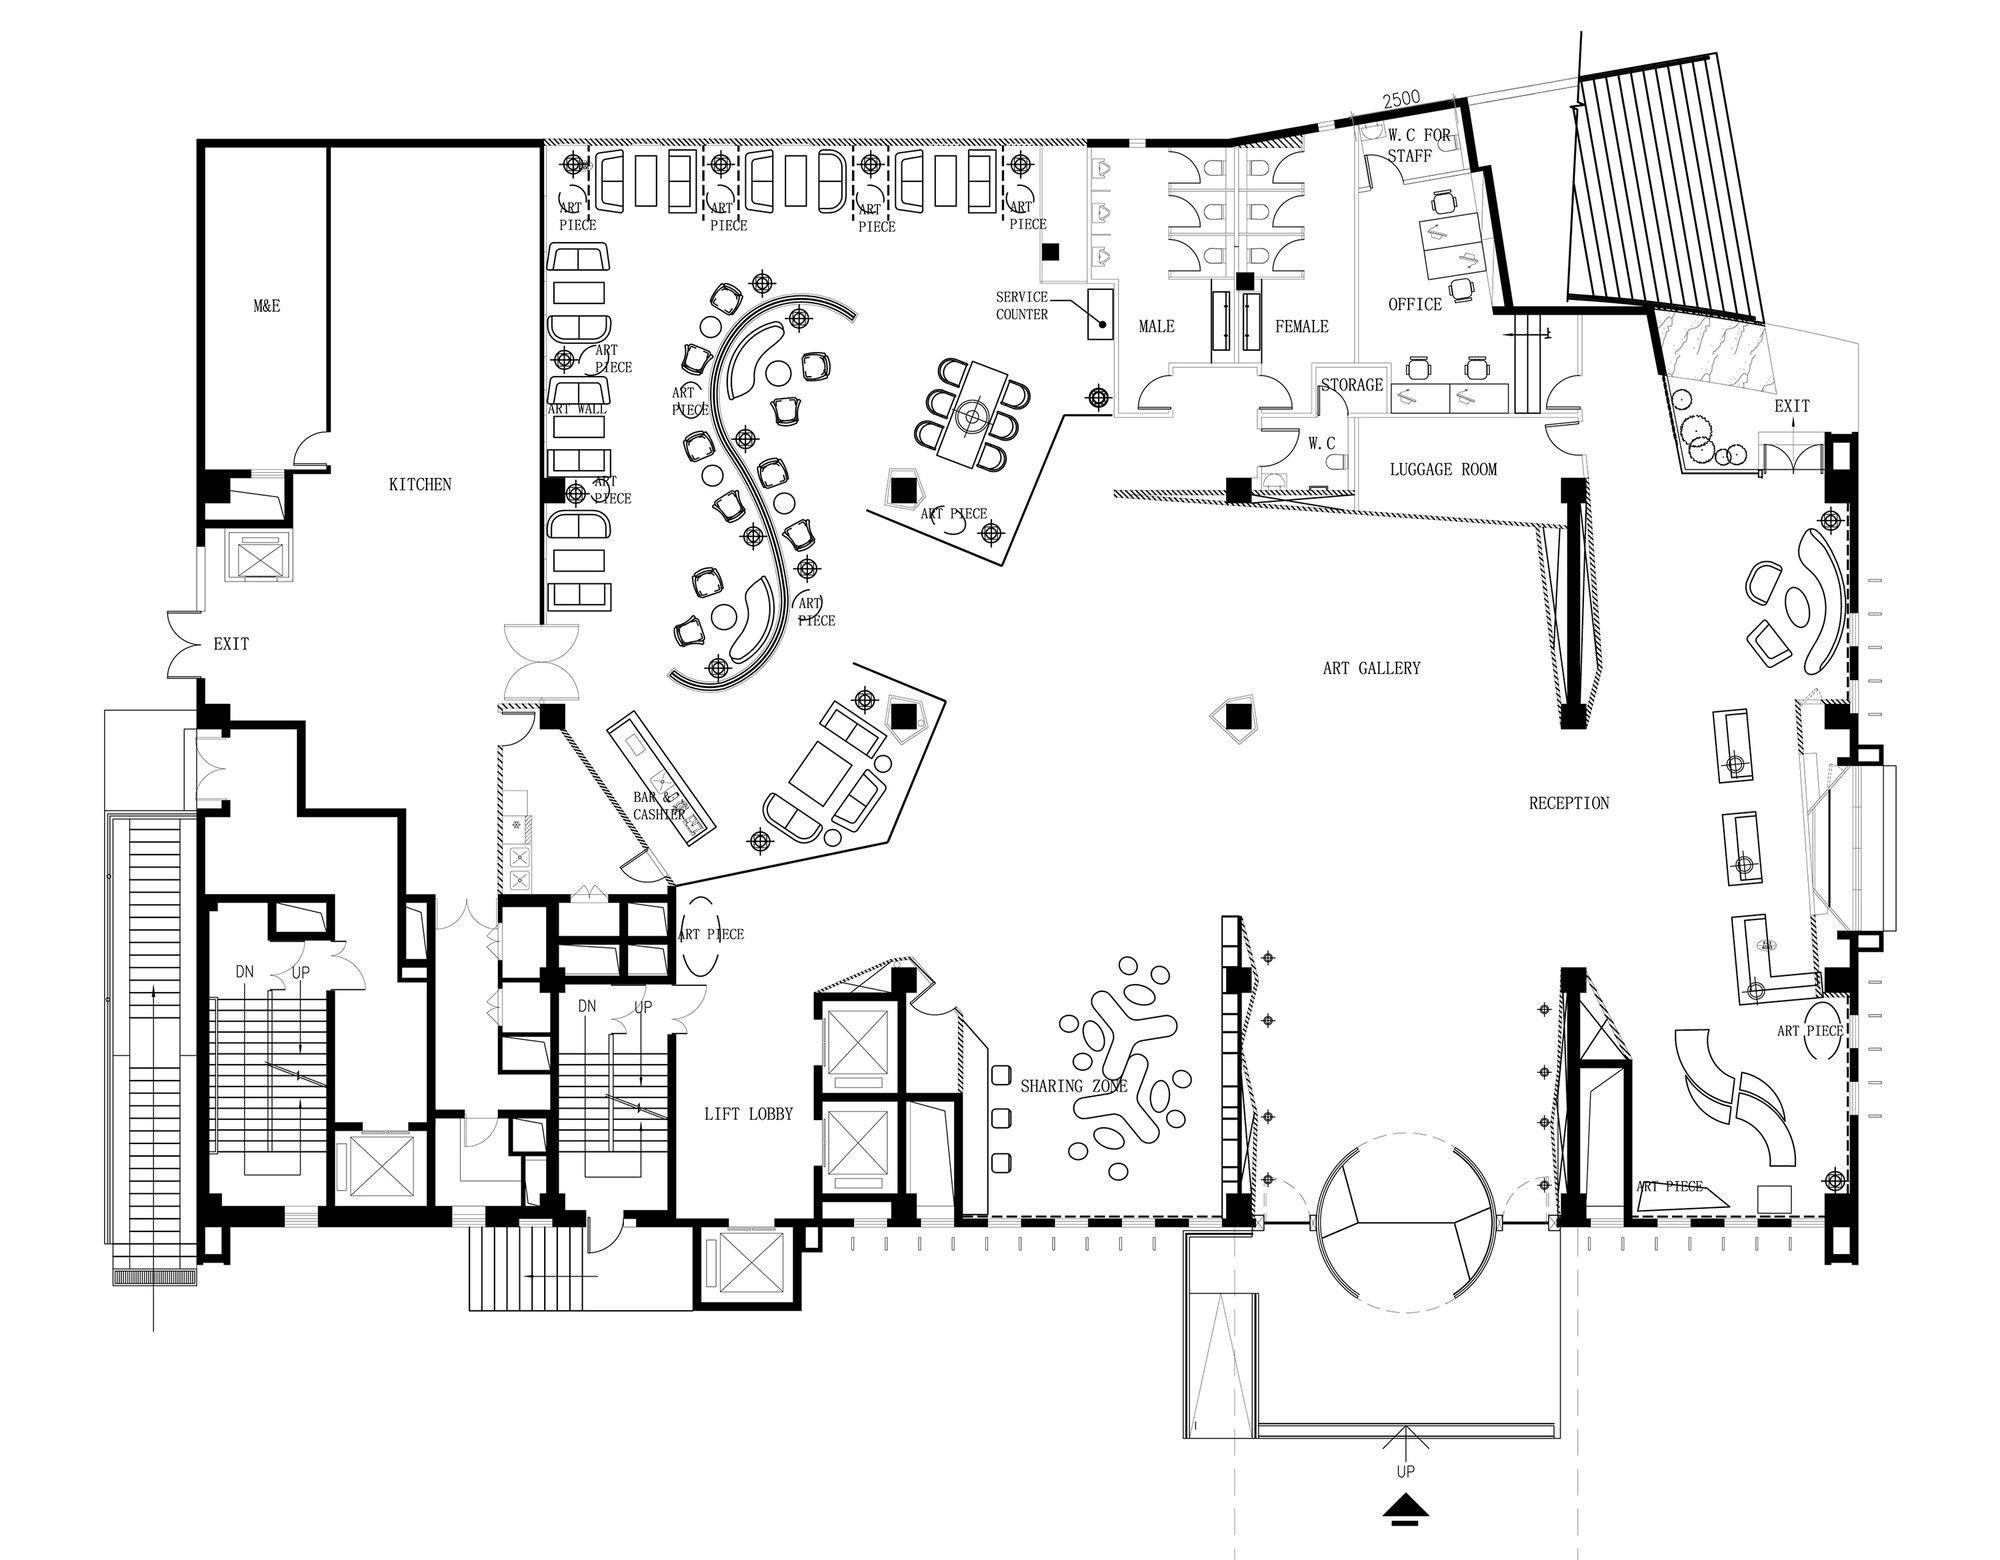 Gallery Of Skytel Panorama 24 Hotel Floor Plan Restaurant Floor Plan Office Layout Plan